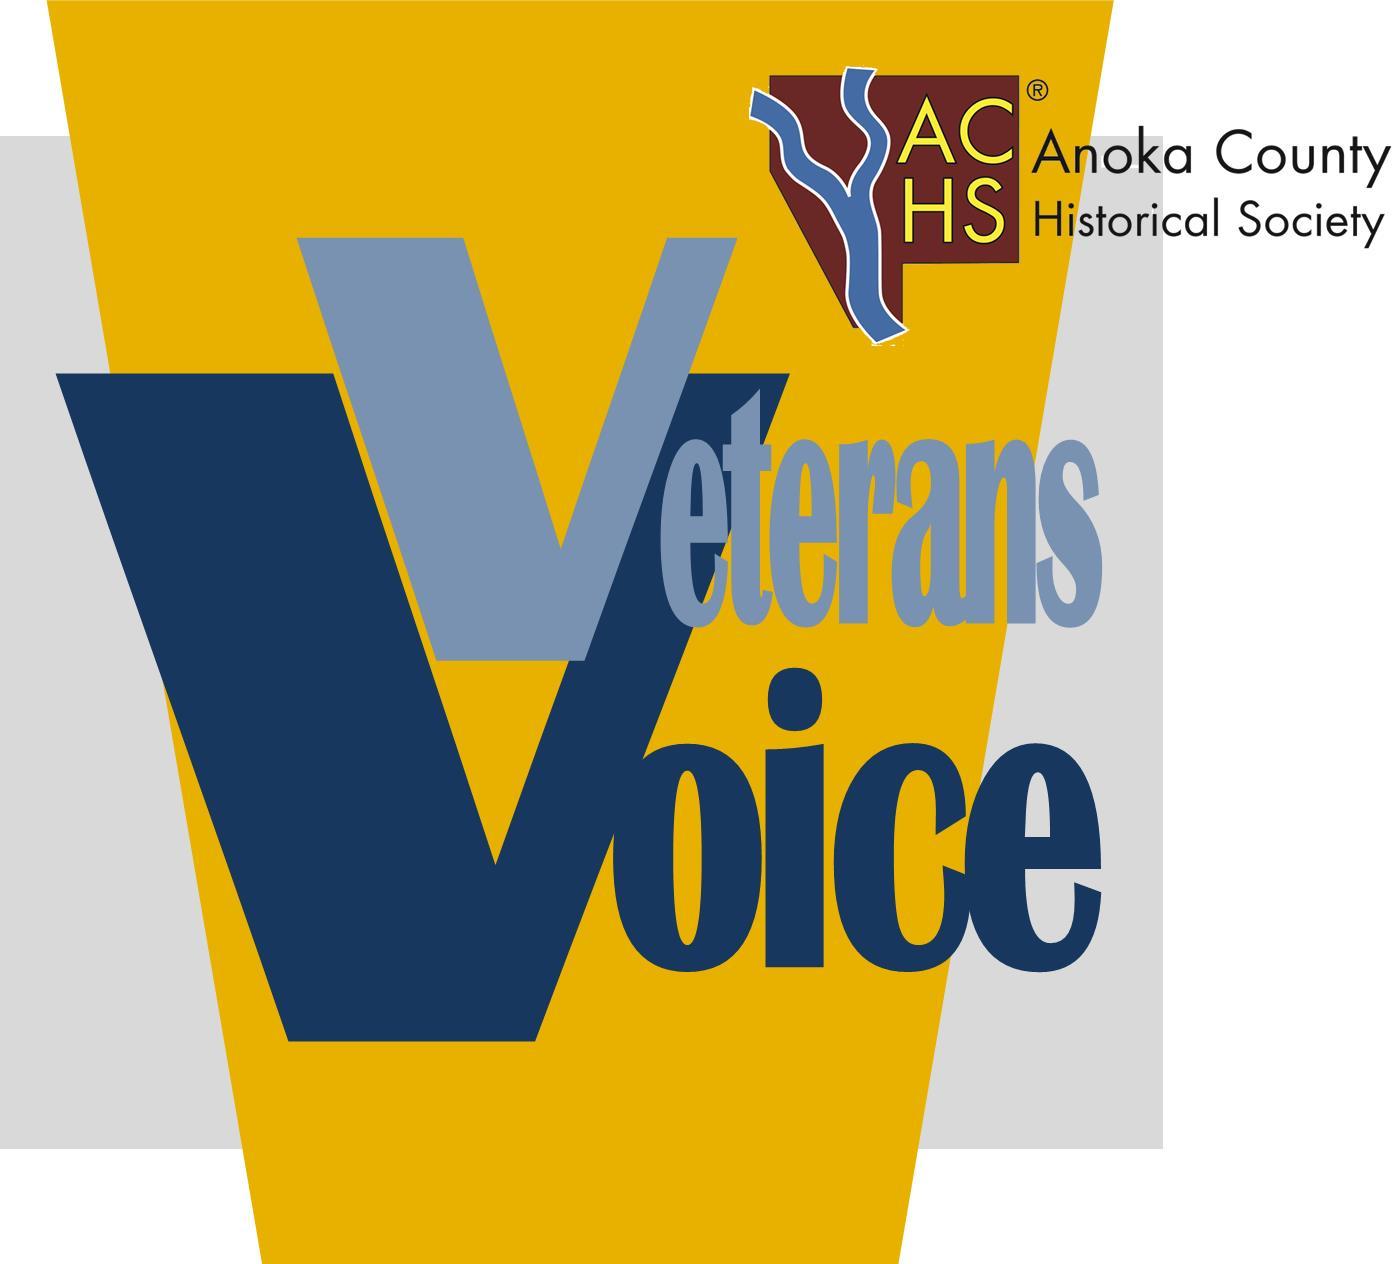 Coming soon: Veterans Voice